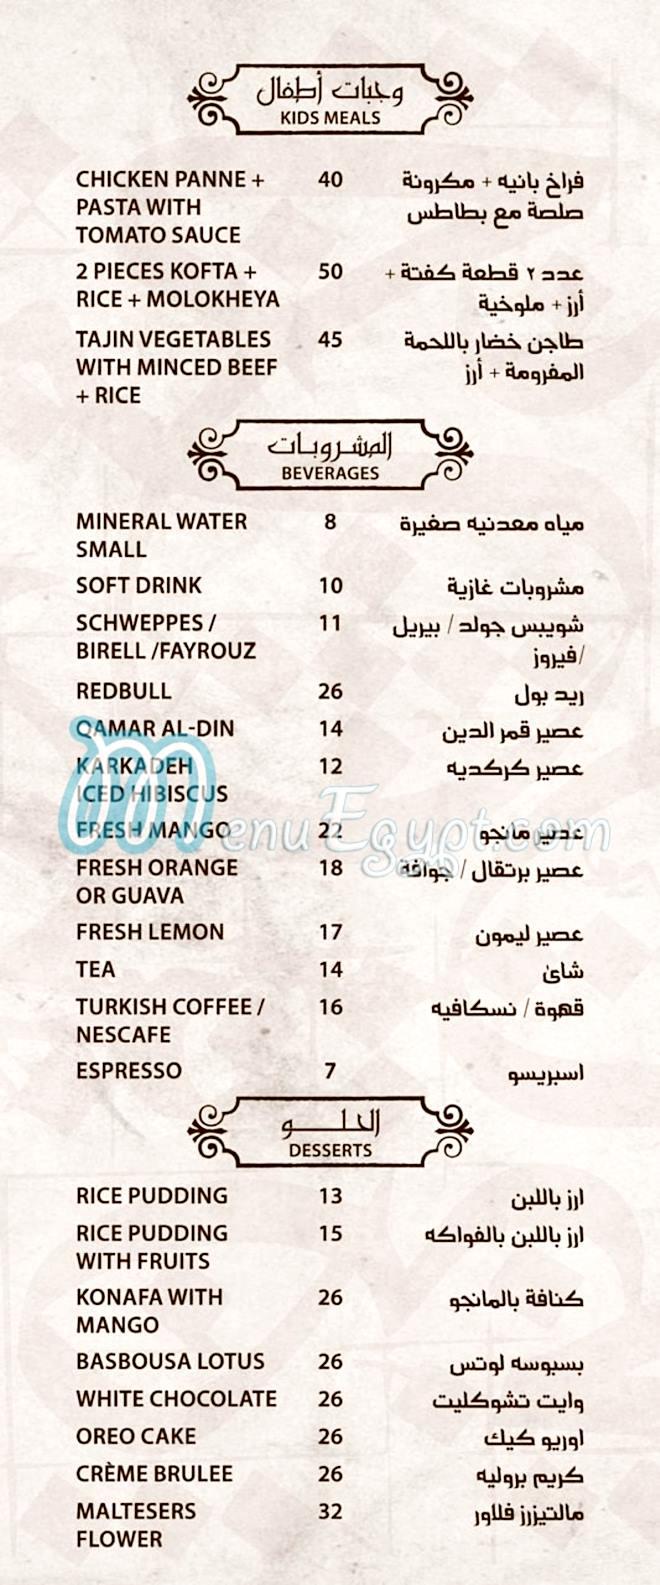 El Dahan egypt